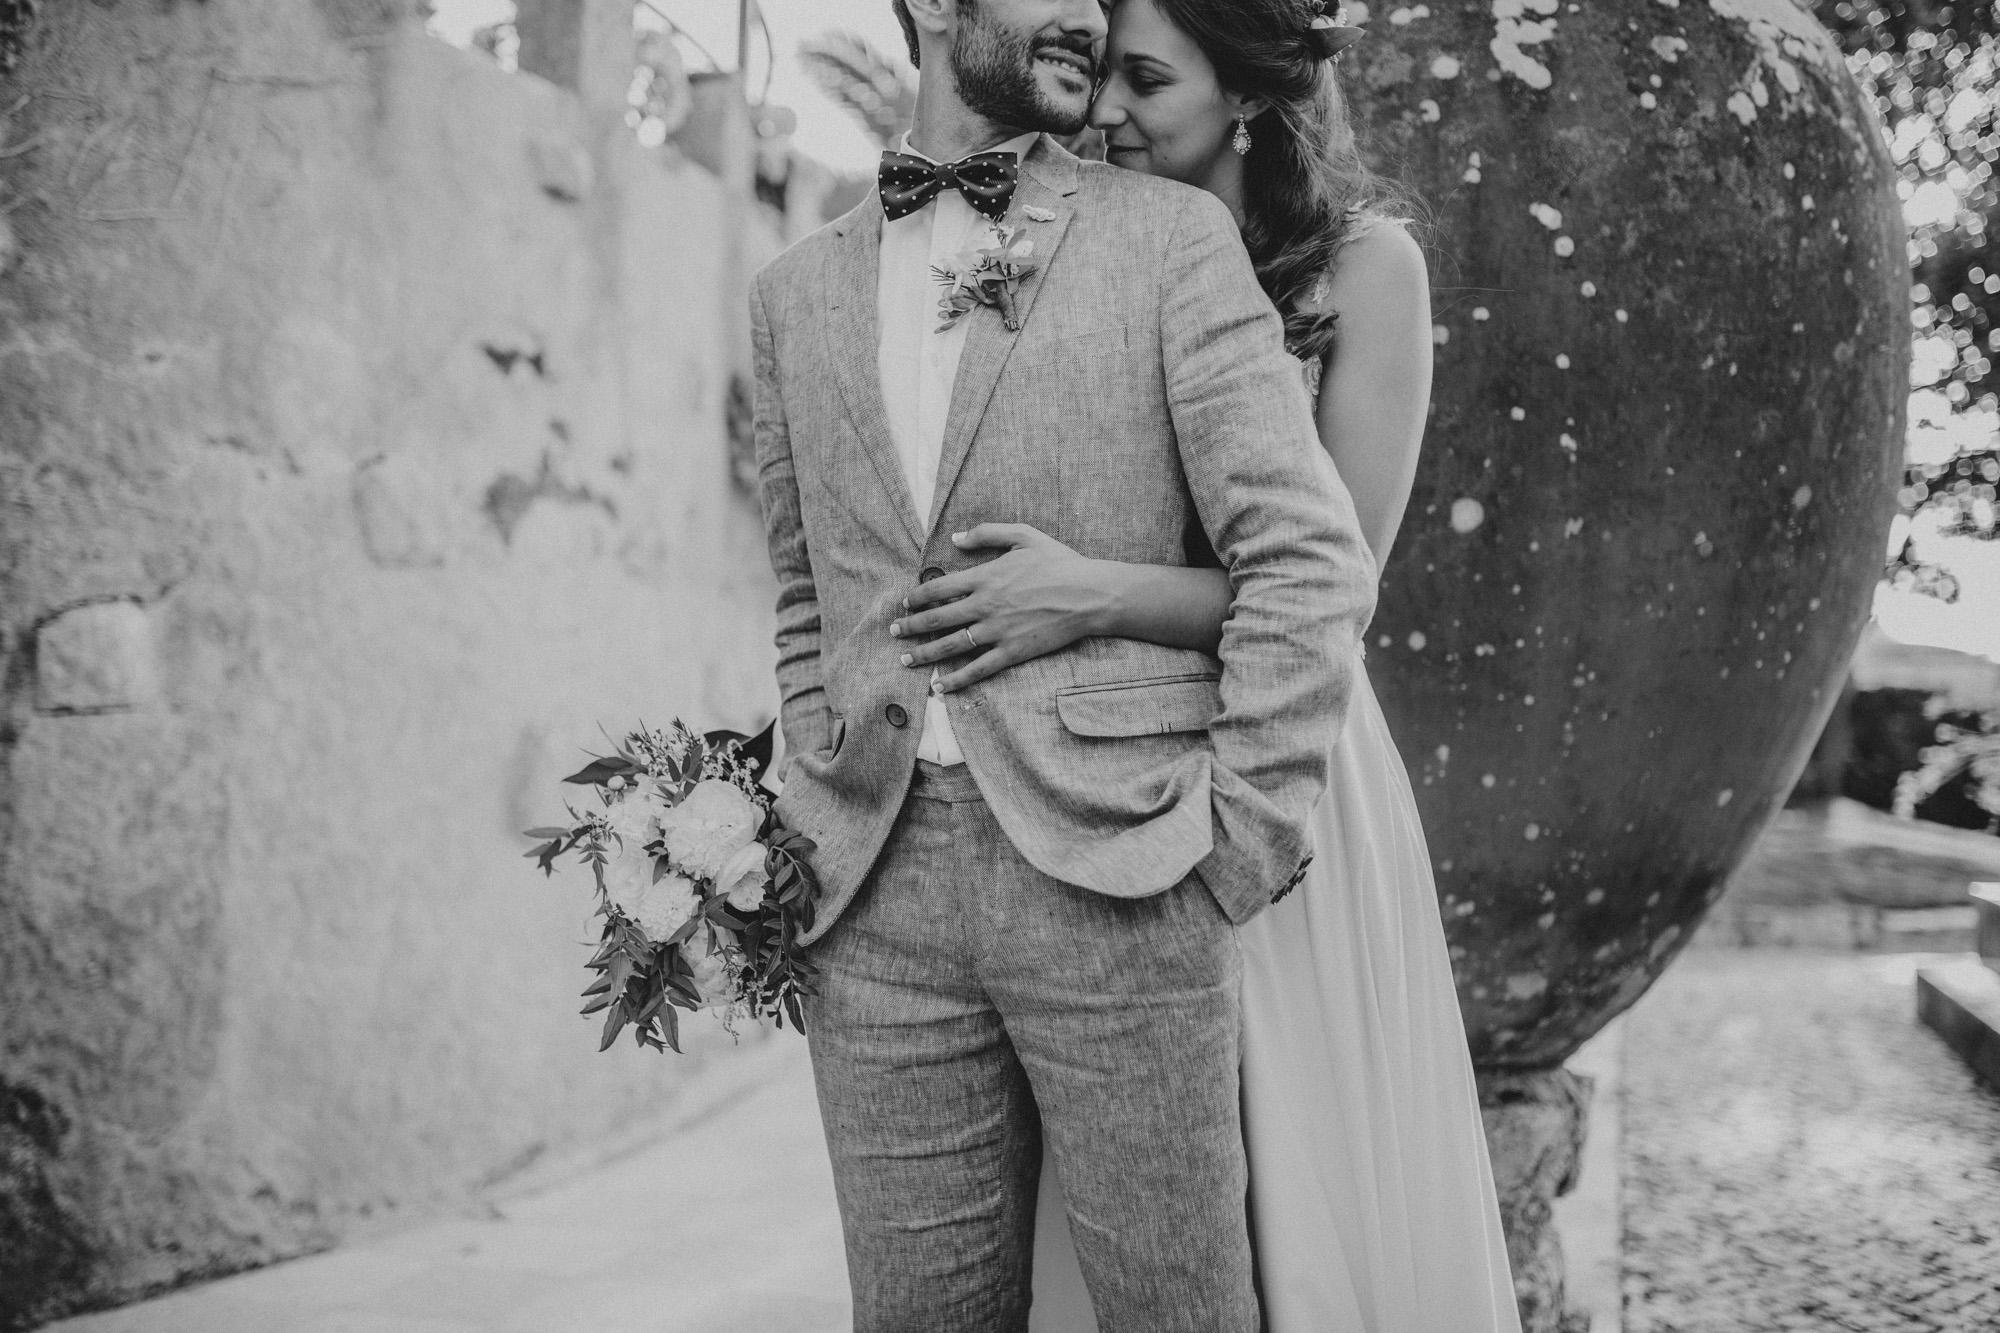 030-carina-e-samuel-wedding-casamento-quinta-dos-rouxinois-rustico-my-fancy-wedding-mafra-malveira-lisboa-sintra-cascais-filipe-santiago-fotografia-fotografo-lifestyle-destination-portugal